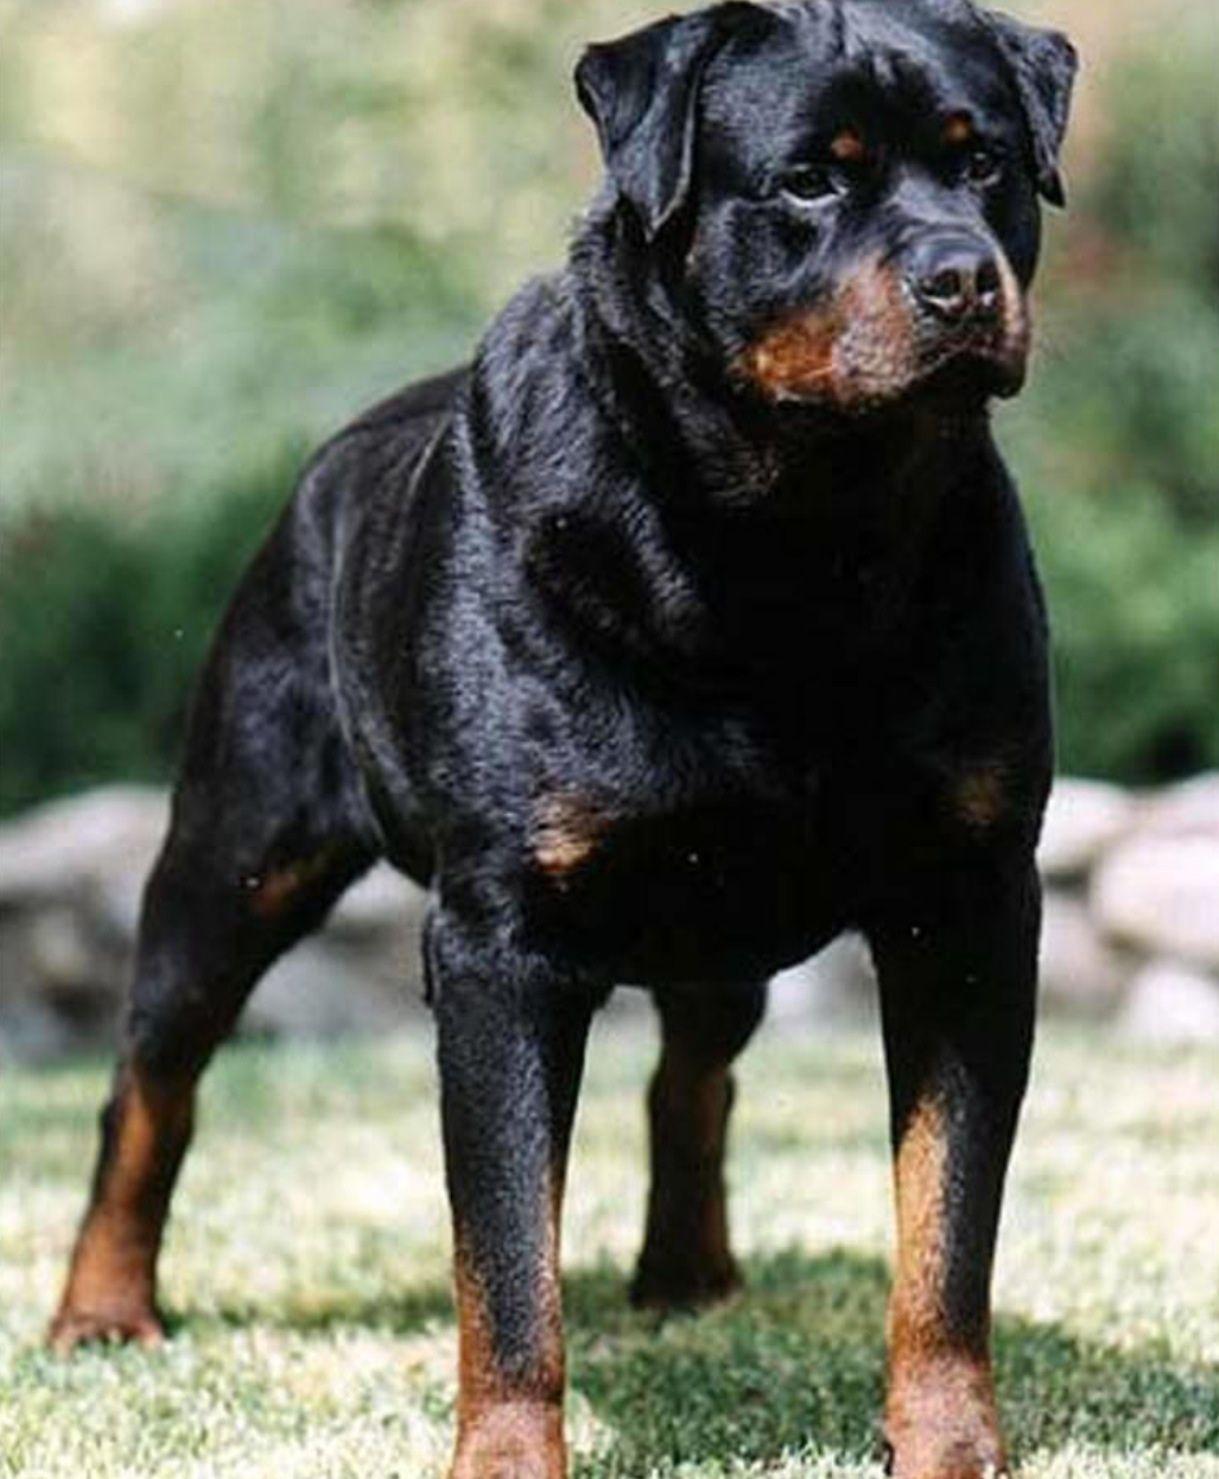 Top 5 Of The World S Largest Dog Breeds Dogs Dog Breeds Rottweiler Dog